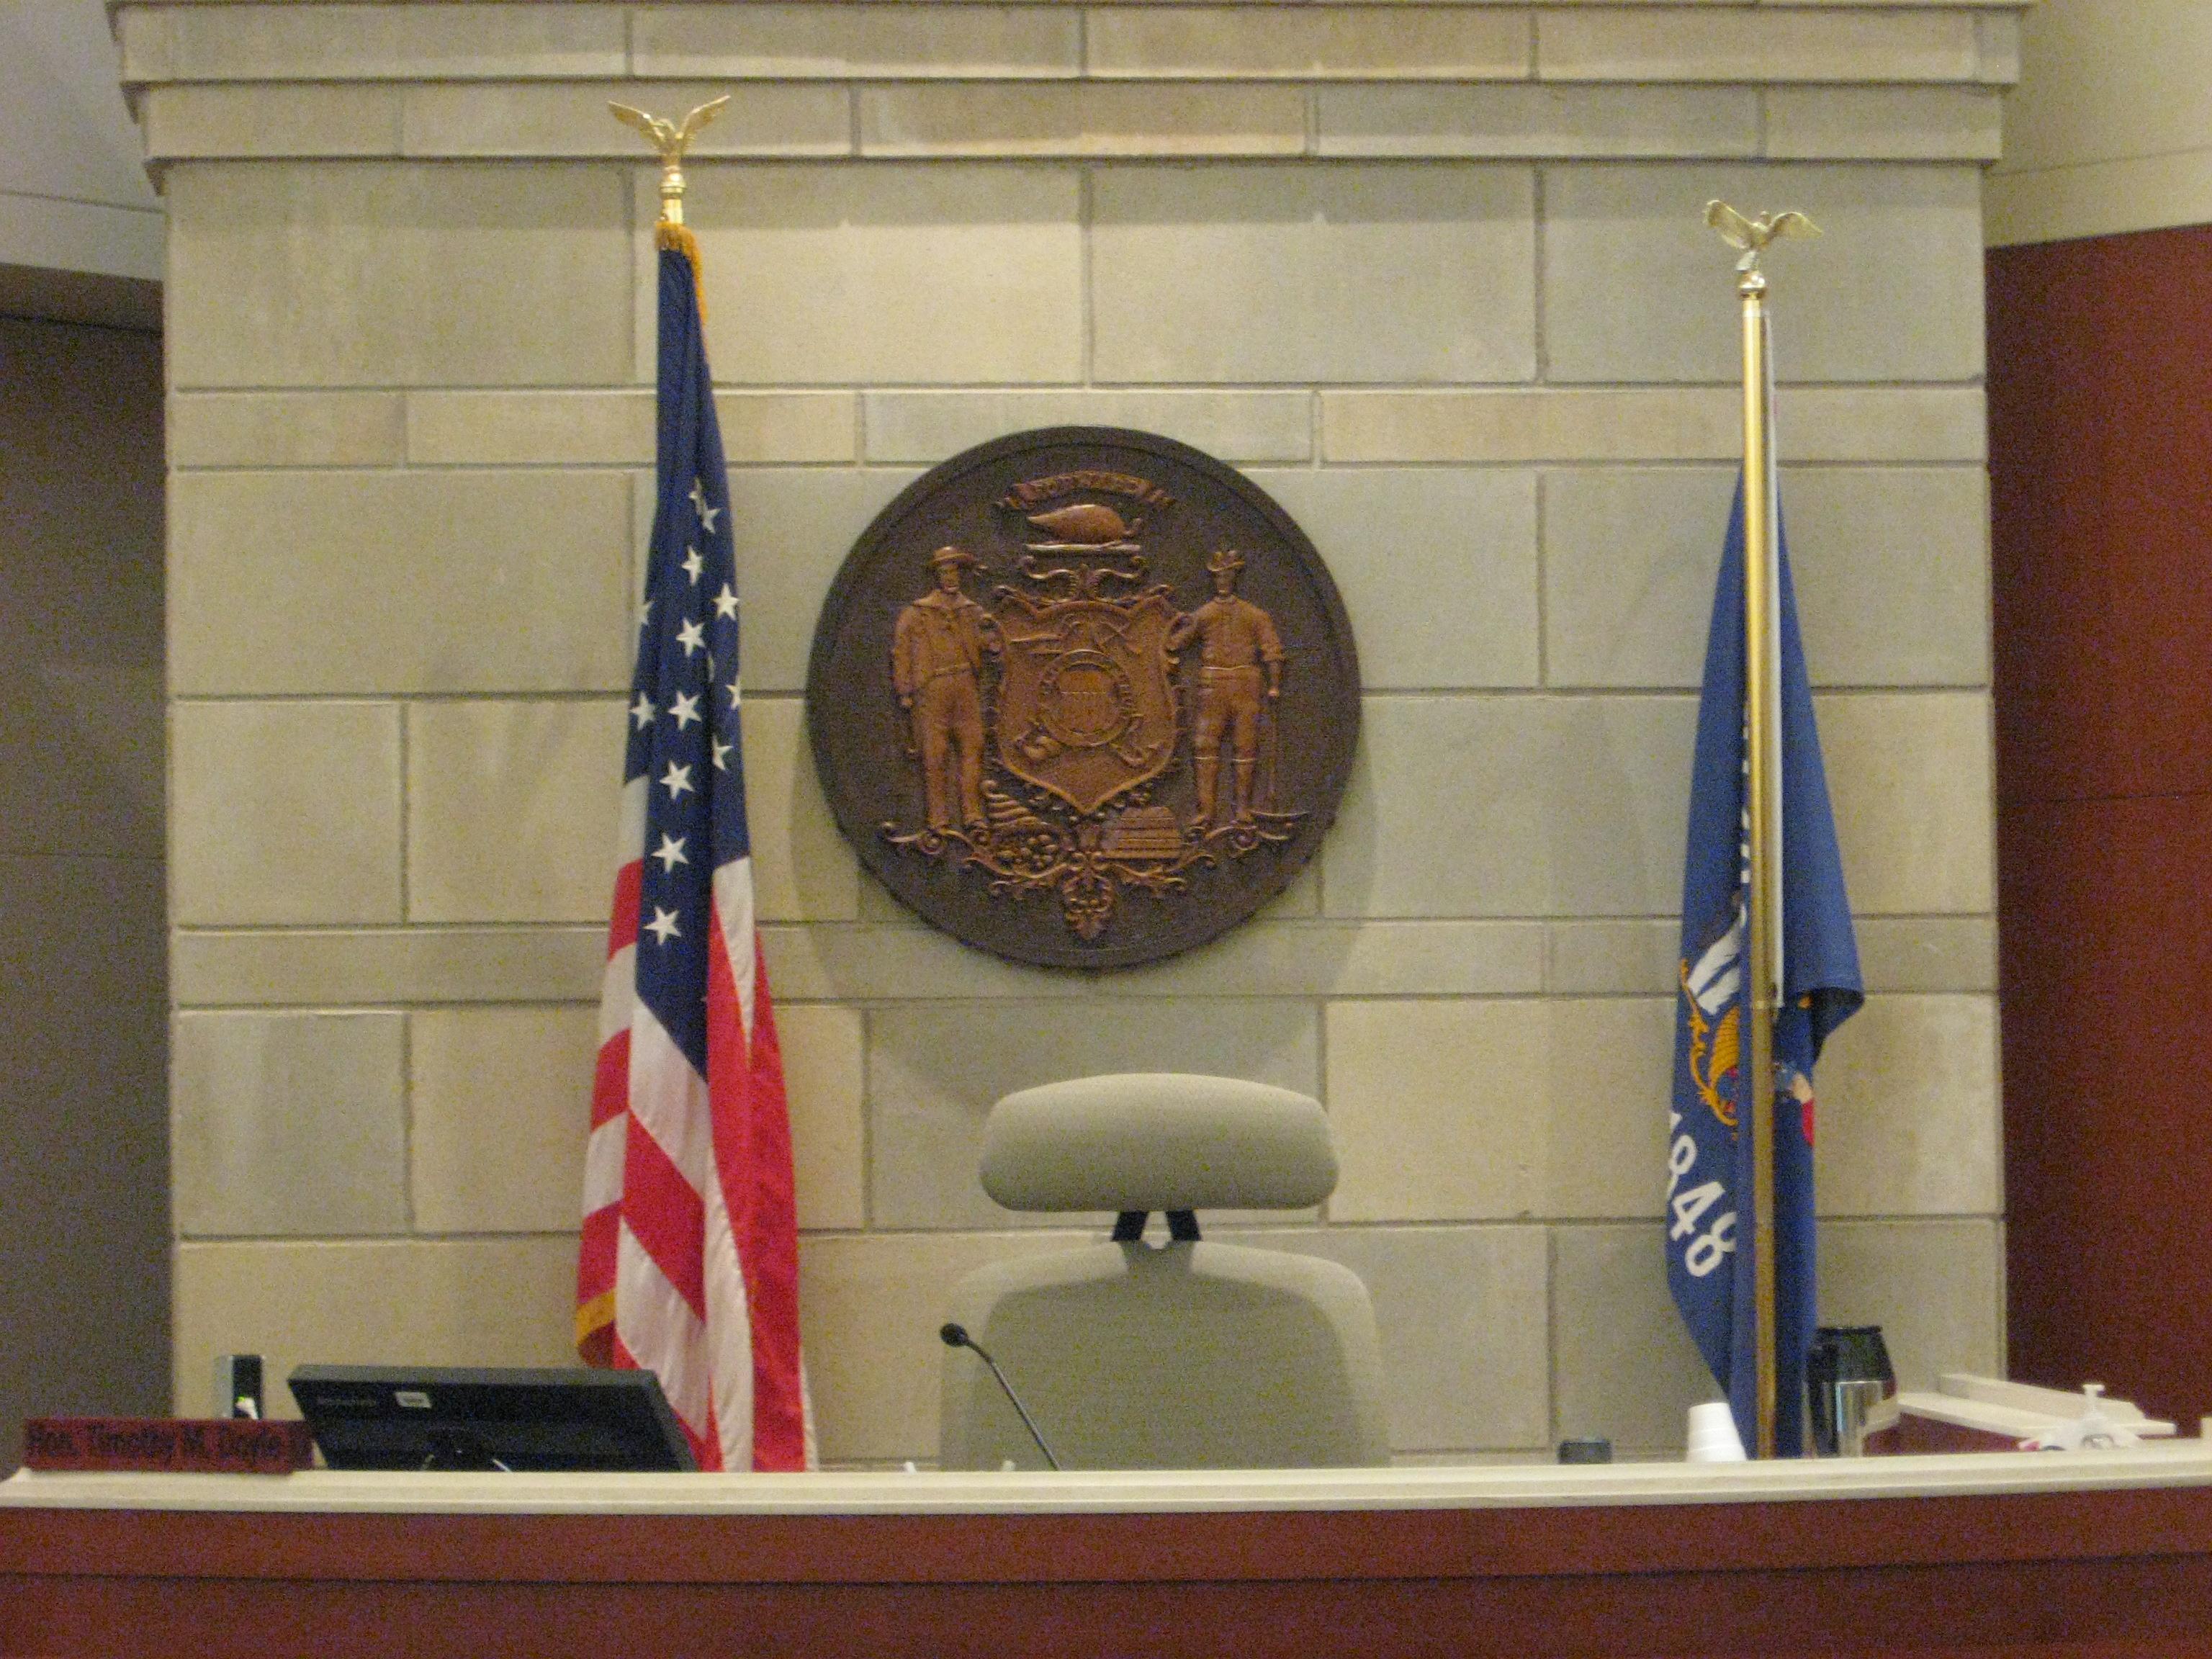 Circuit Court - Barron County, Wisconsin - www